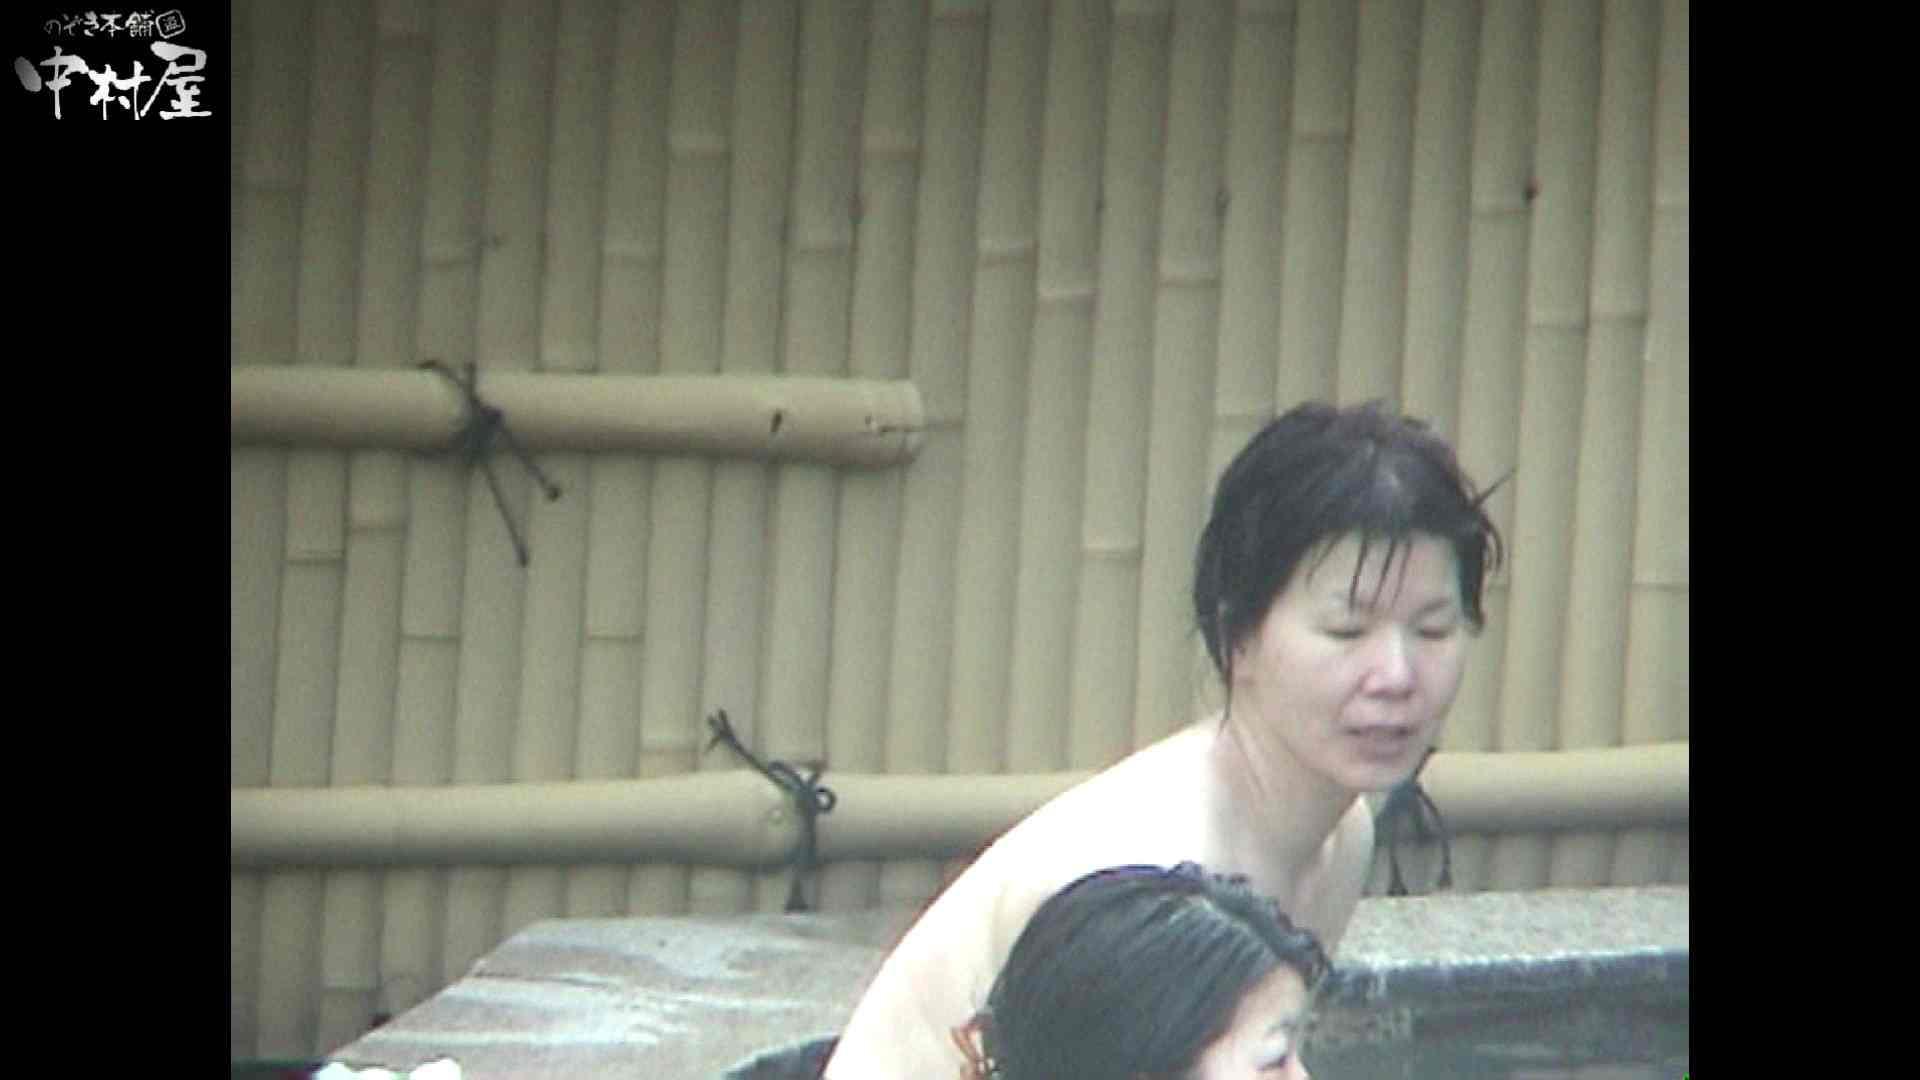 Aquaな露天風呂Vol.936 盗撮特撮  11pic 3